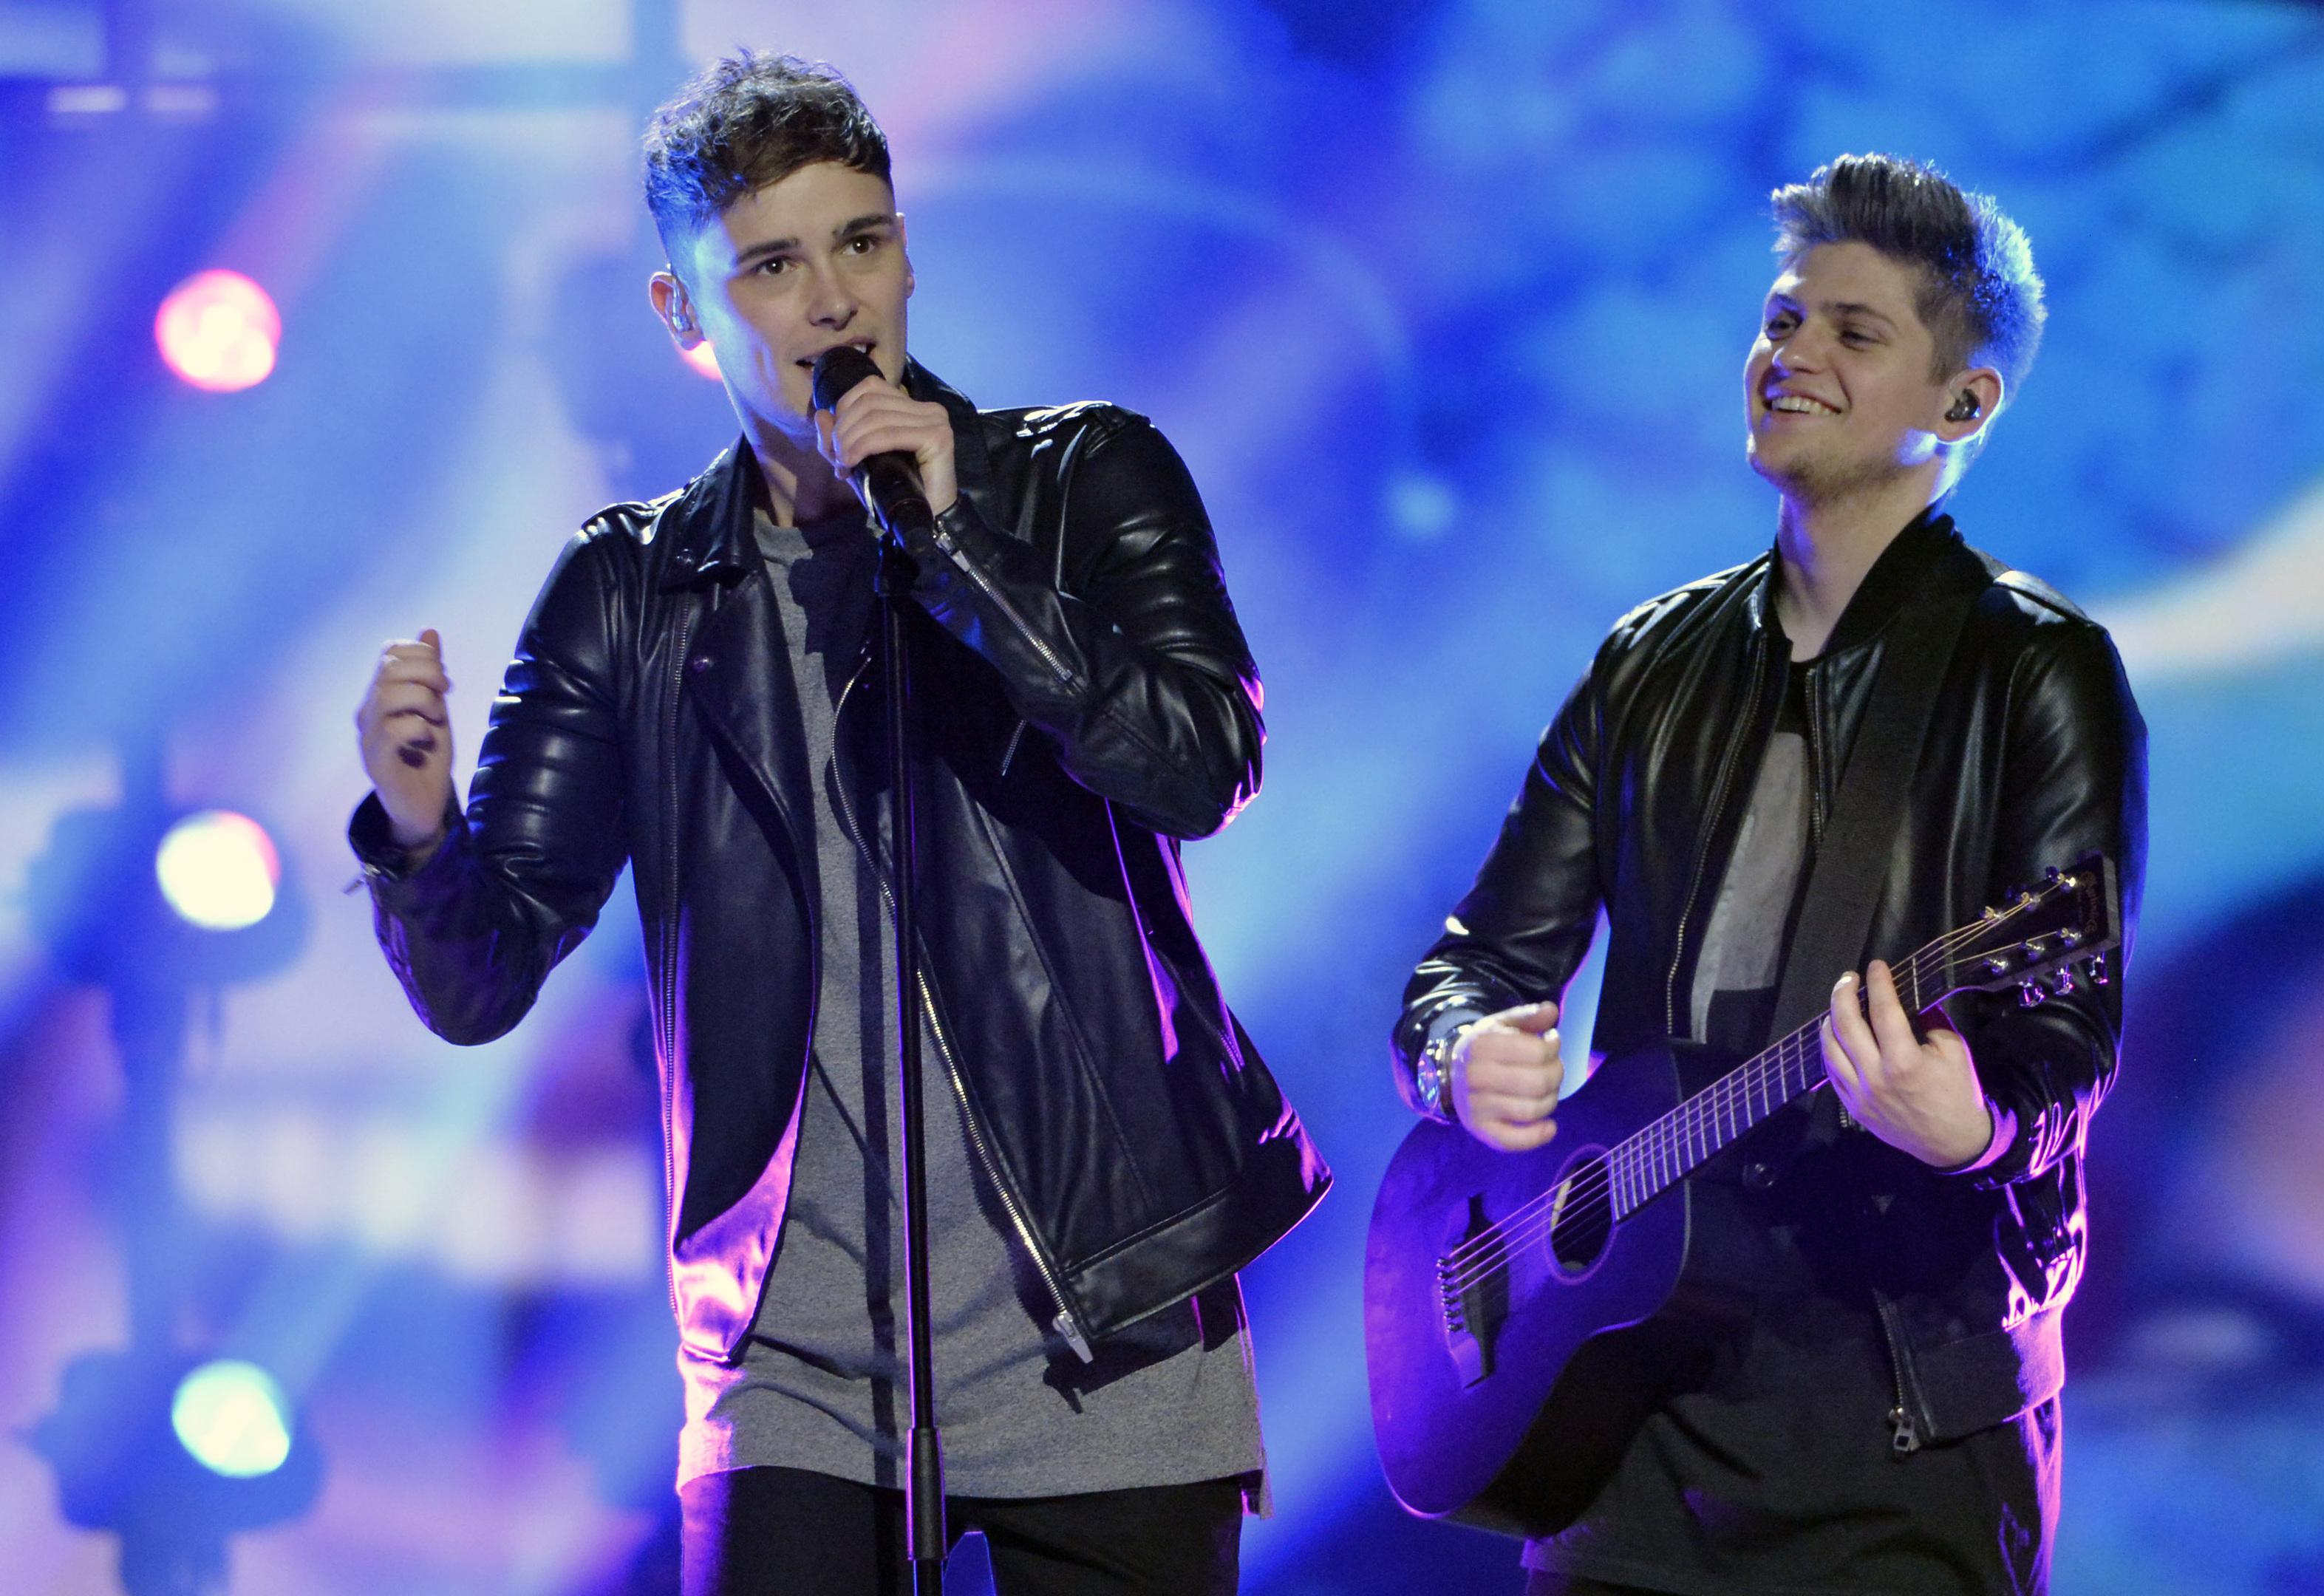 Joe and Jake rehearse ahead of Eurovision (Jonas Ekstromer/TT via AP)